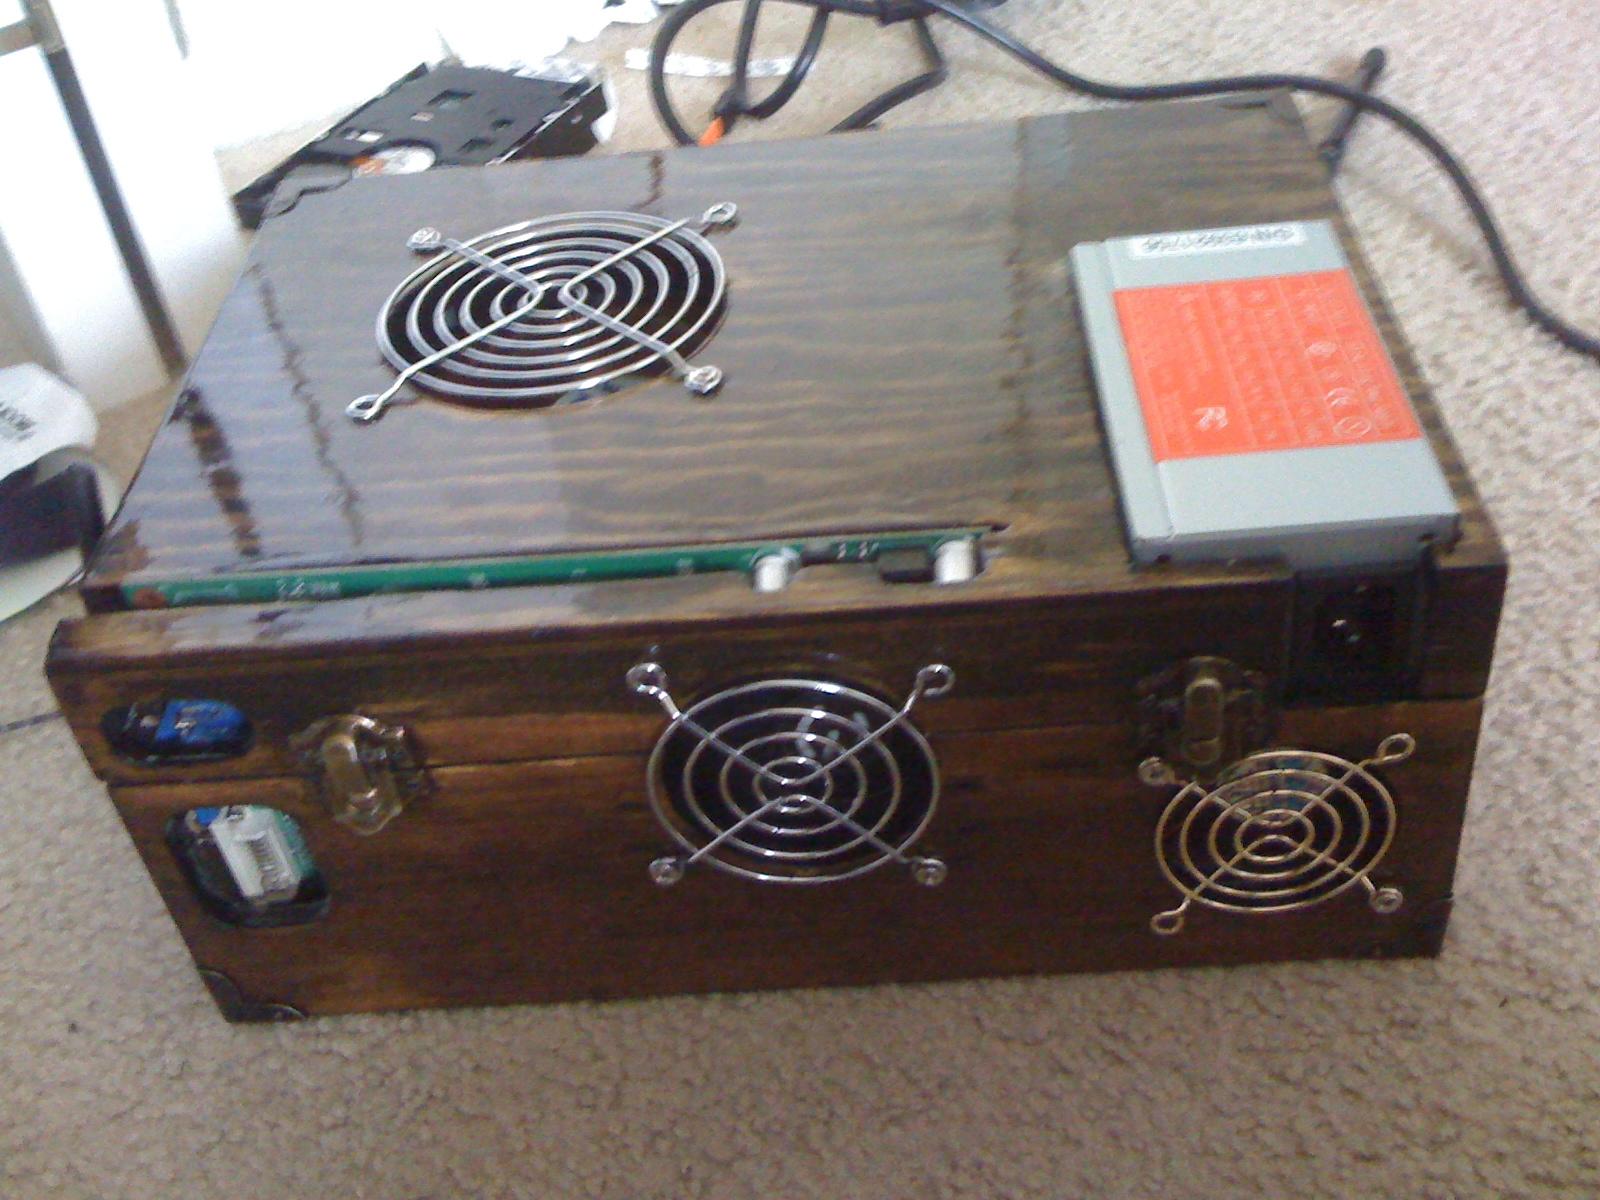 $8 Wooden box computer case mod!!